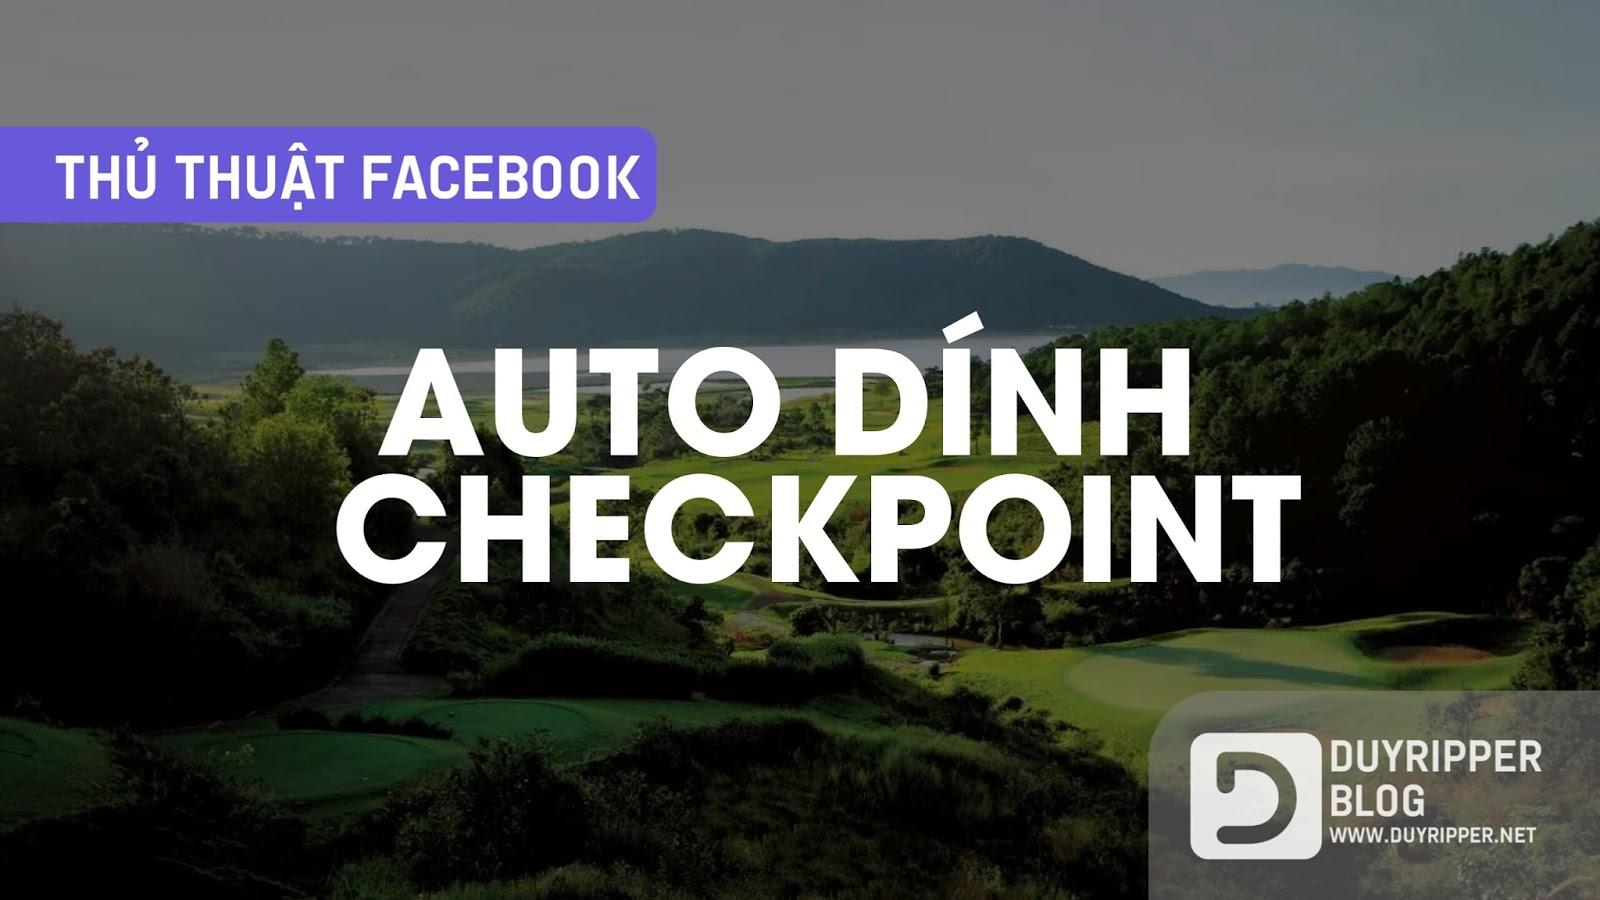 Thủ thuật auto dính checkpoint facebook